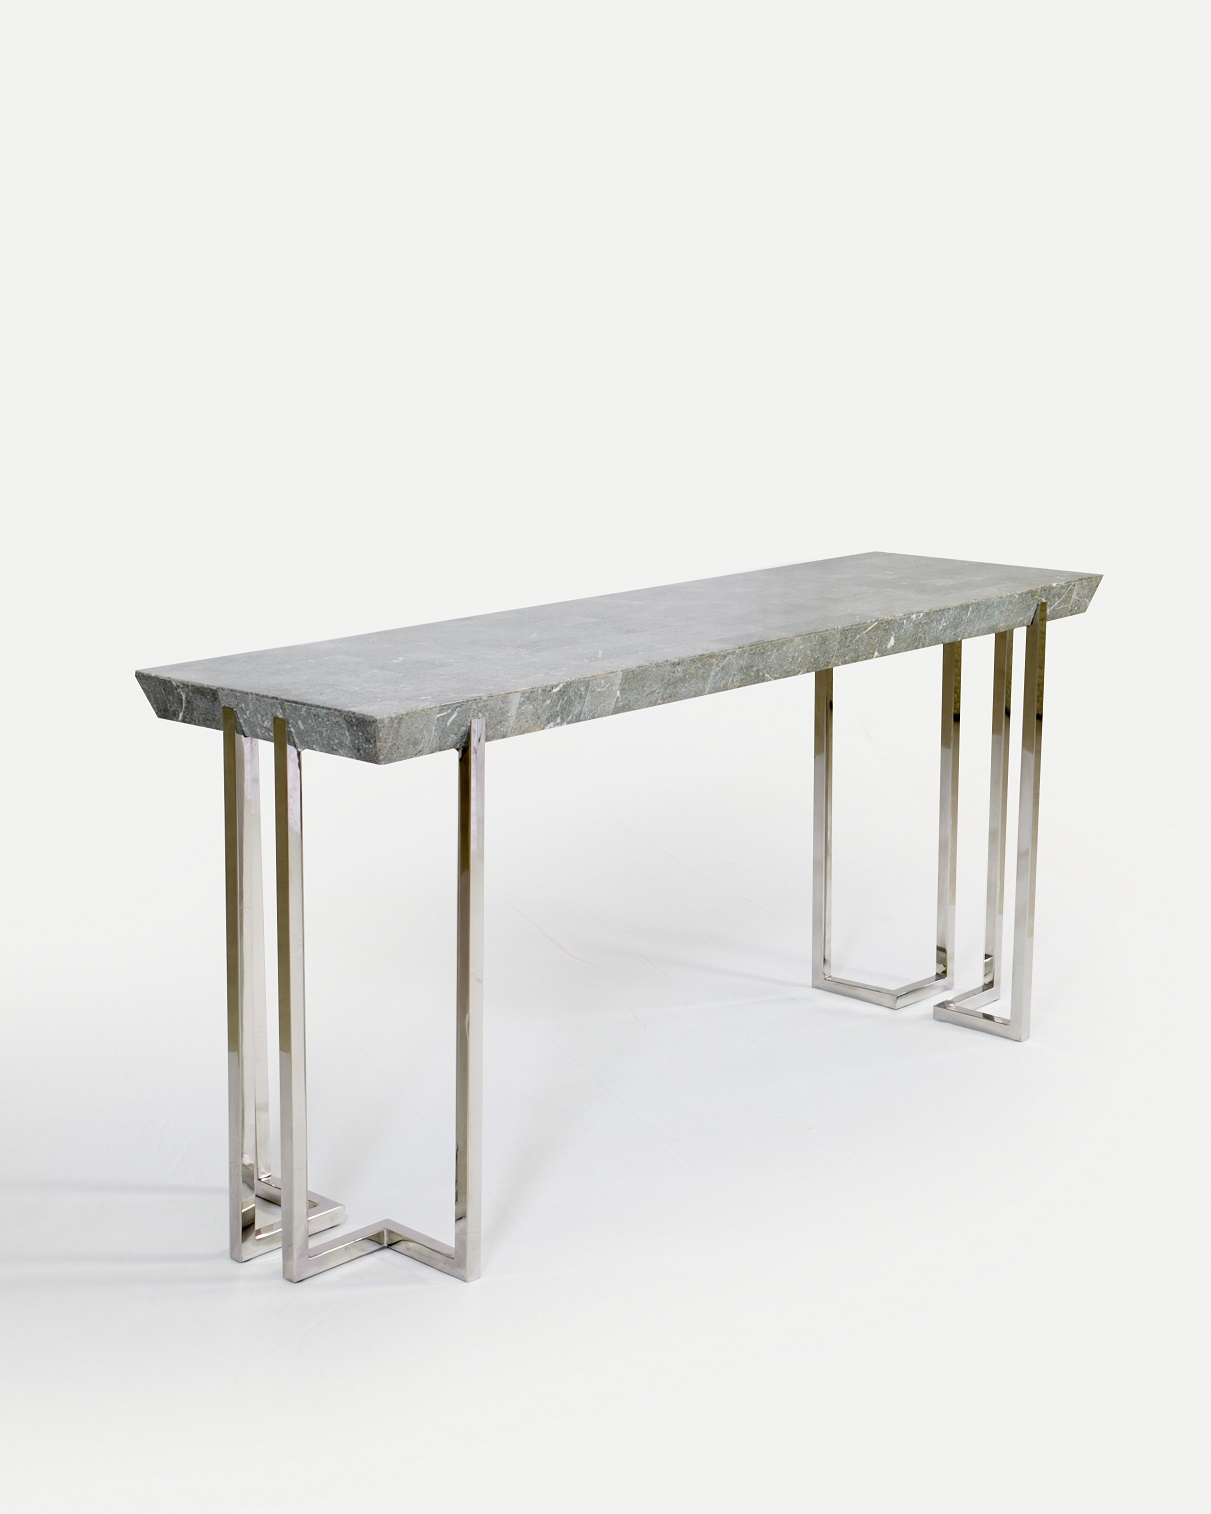 Co-Creative Studio, Detalia Aurora, Ercole Tables, Gray Stone Lamination, Stainless Steel A.jpg